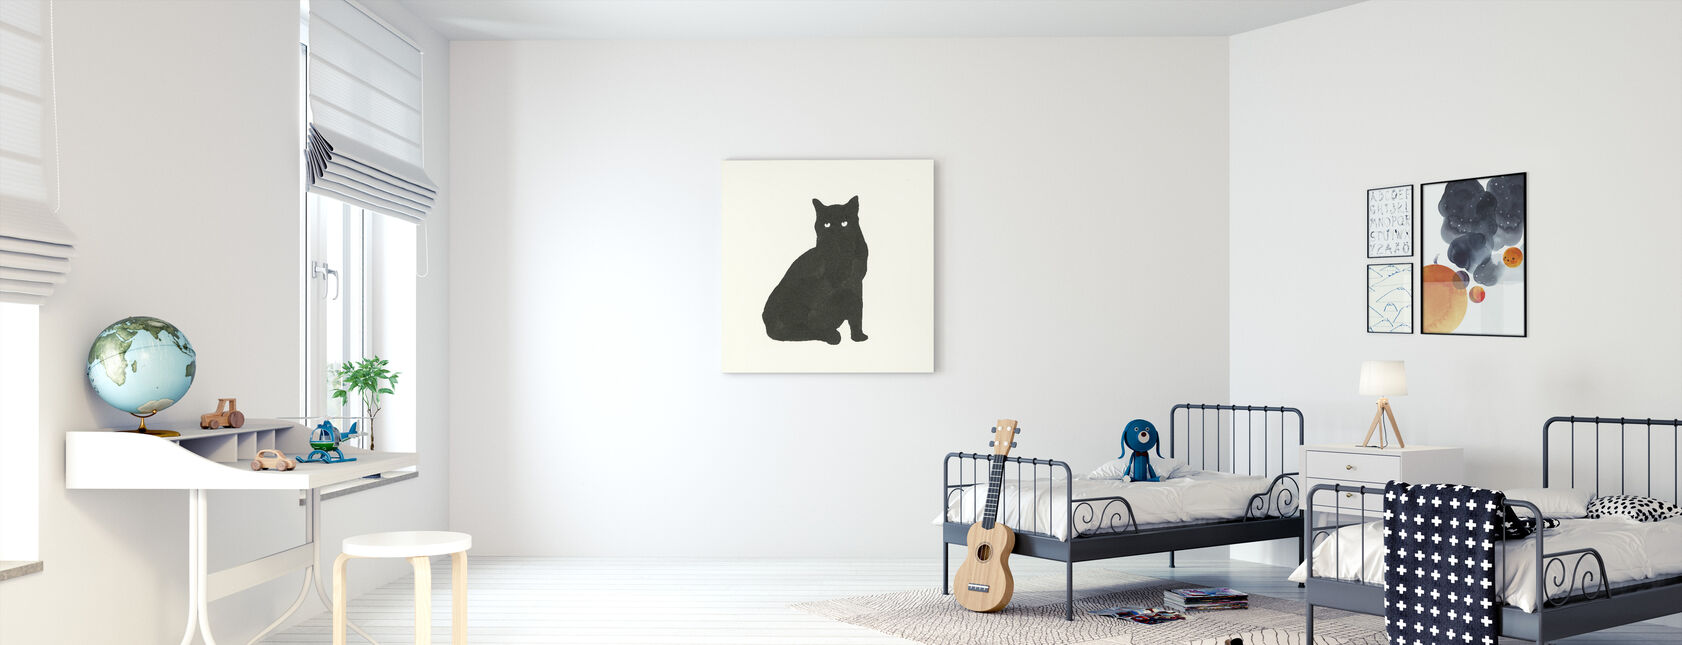 Svart katt - Canvastavla - Barnrum